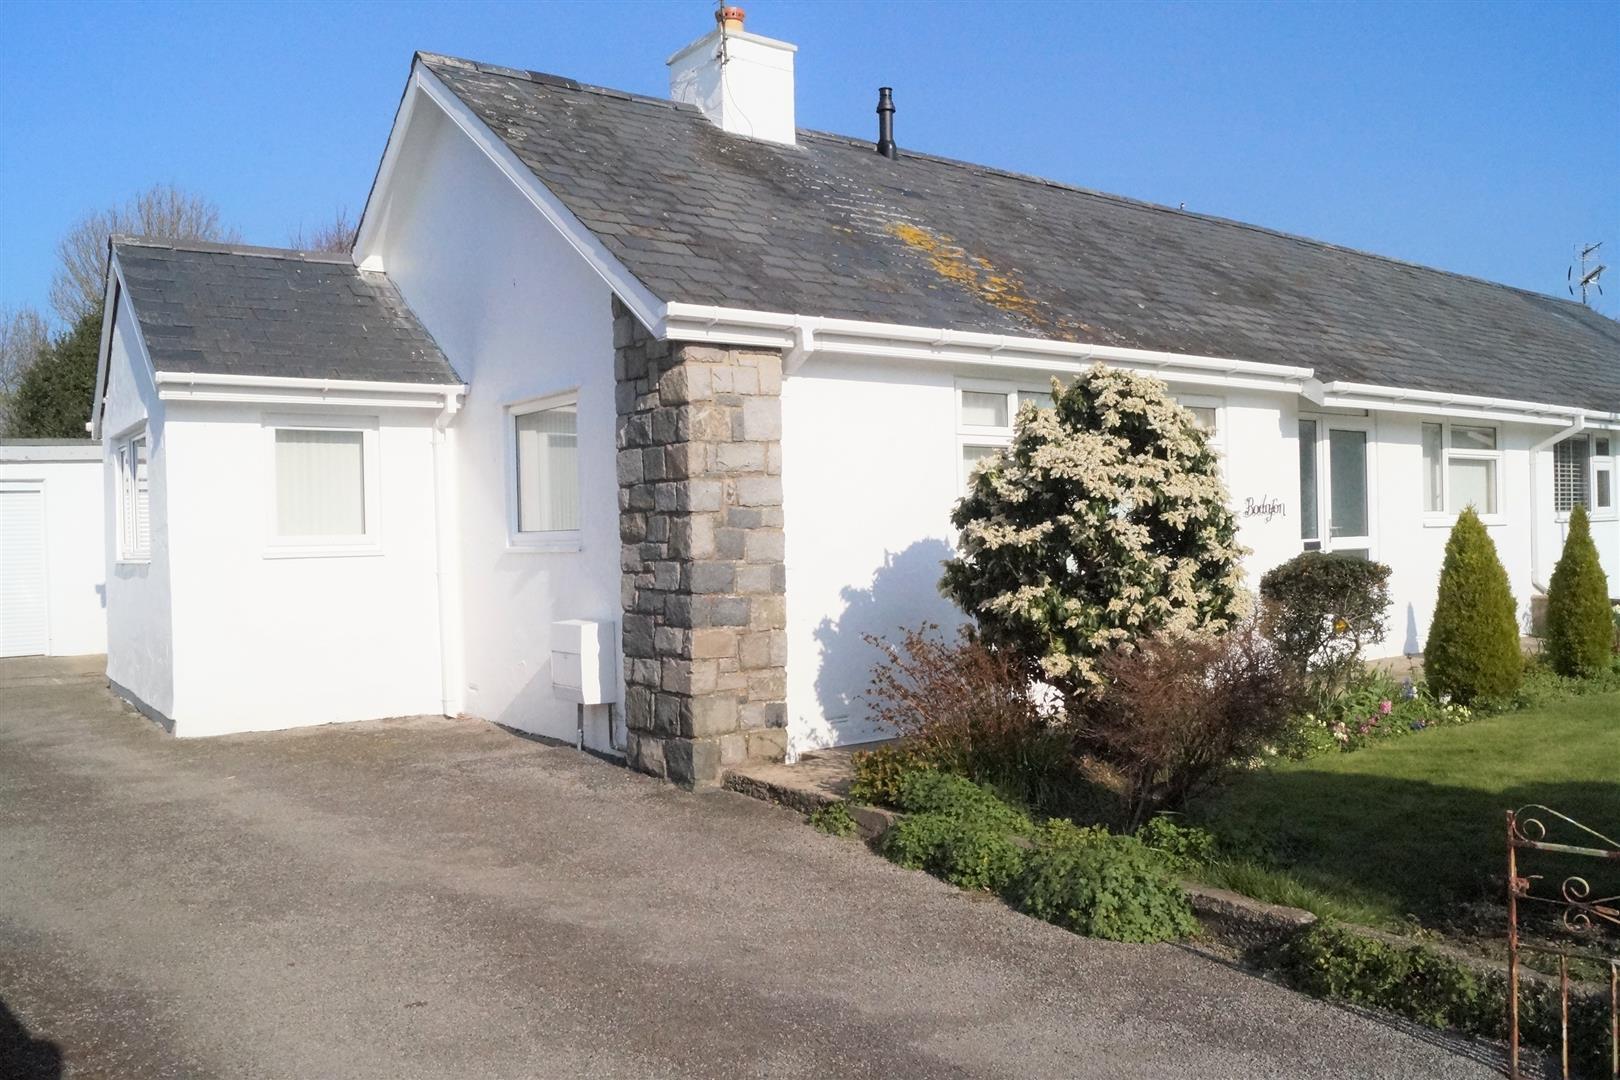 Glanerch, Abererch, Pwllheli - £190,000/Realistic offers considered